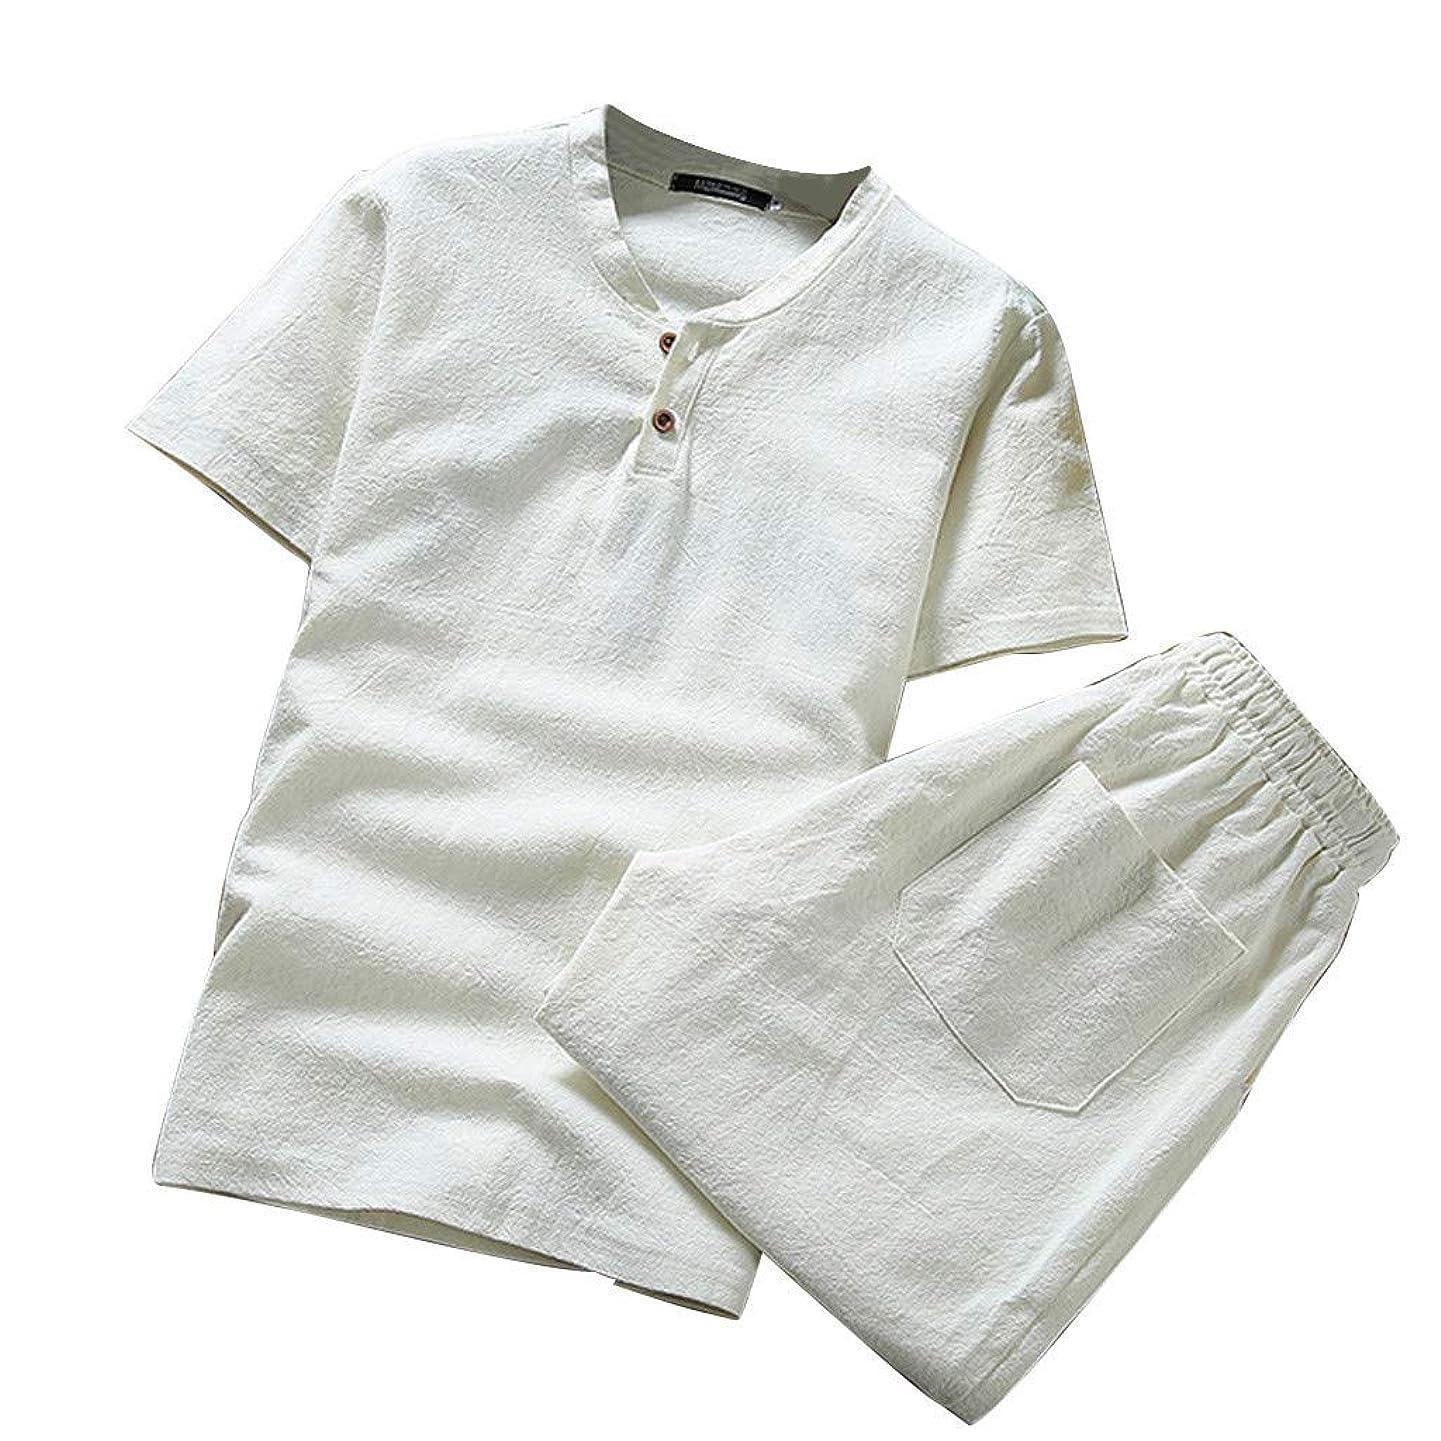 Outfits Sets for Men, F_Gotal Men's Casual Summer Solid Color Cotton Linen 2 Pieces Outfits T-Shirt Beach Shorts Set